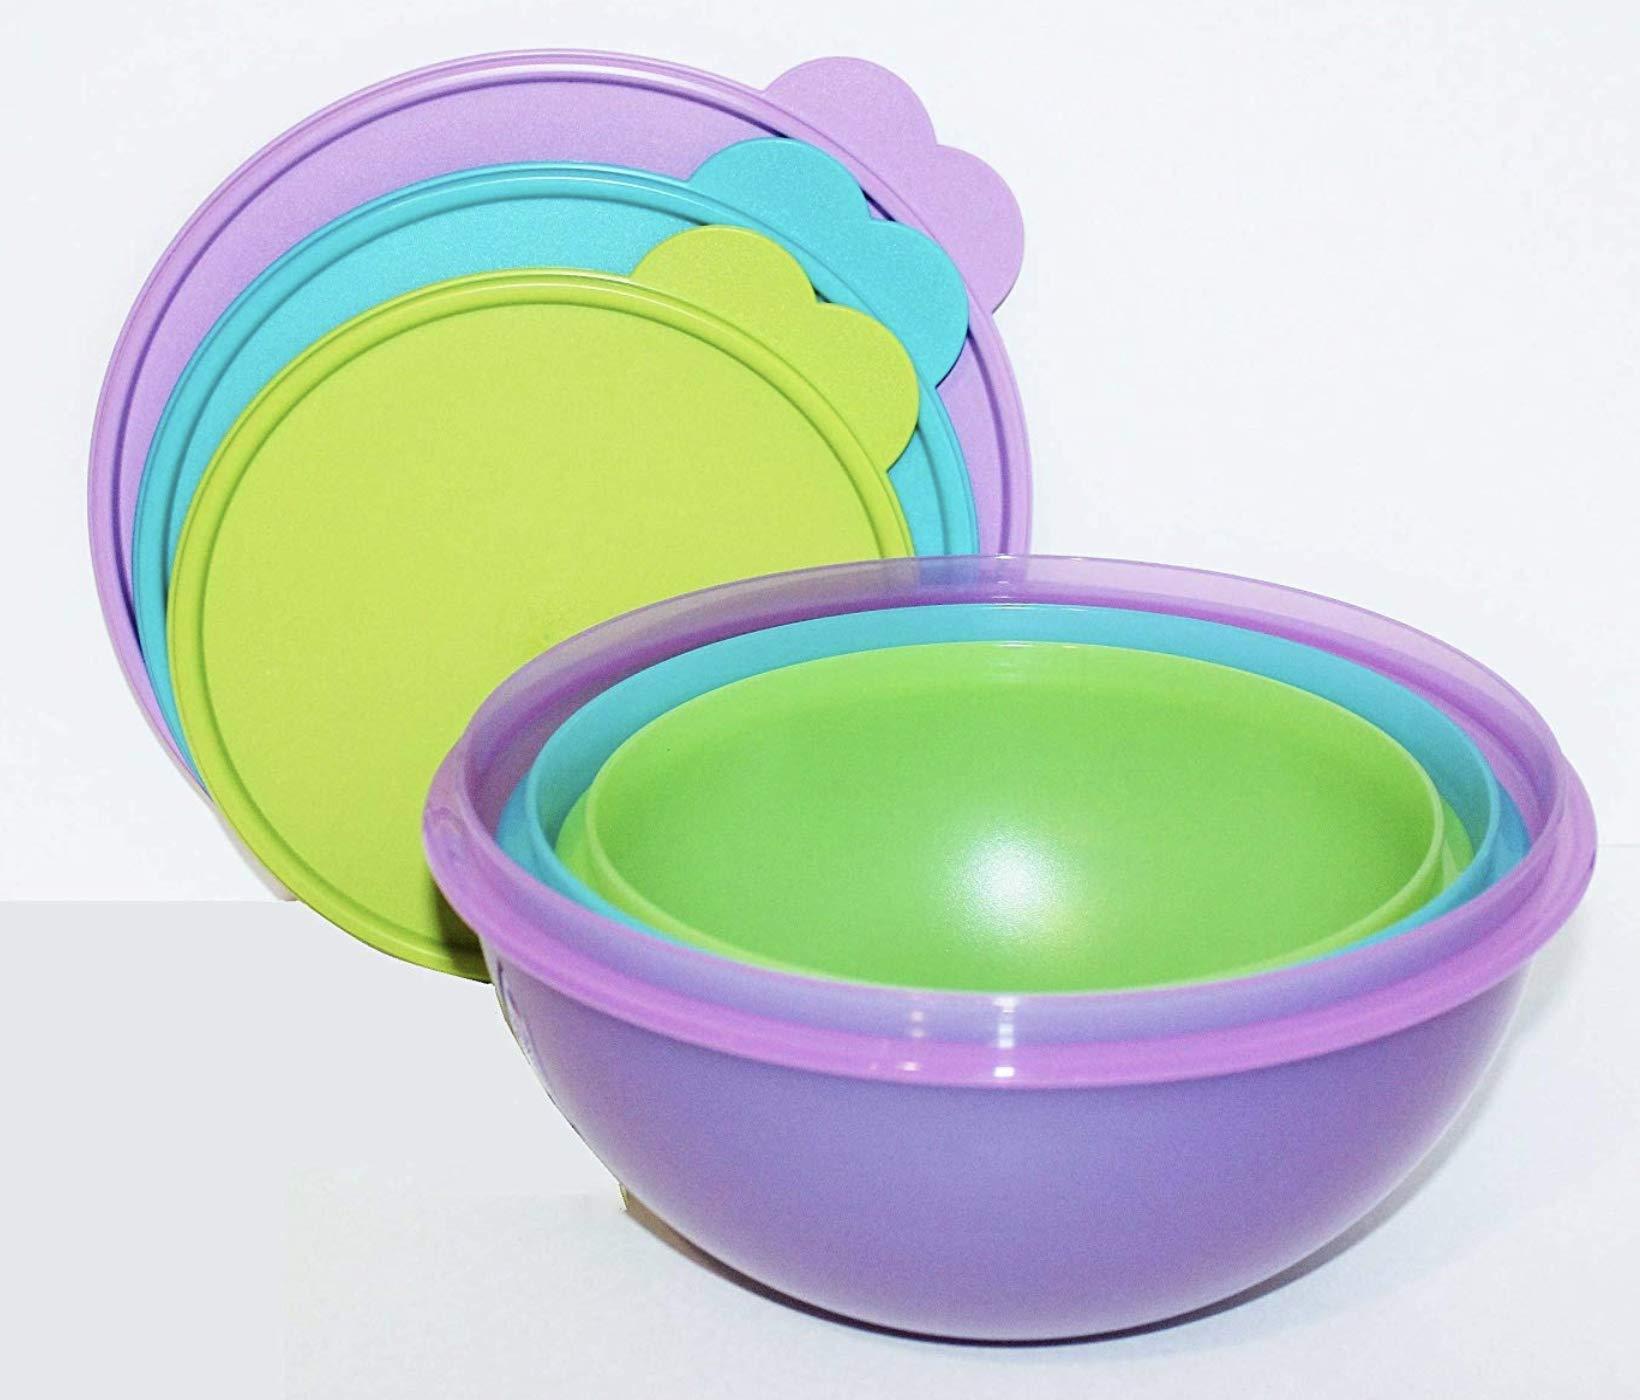 Tupperware Wonderlier Bowl Set Newest Color